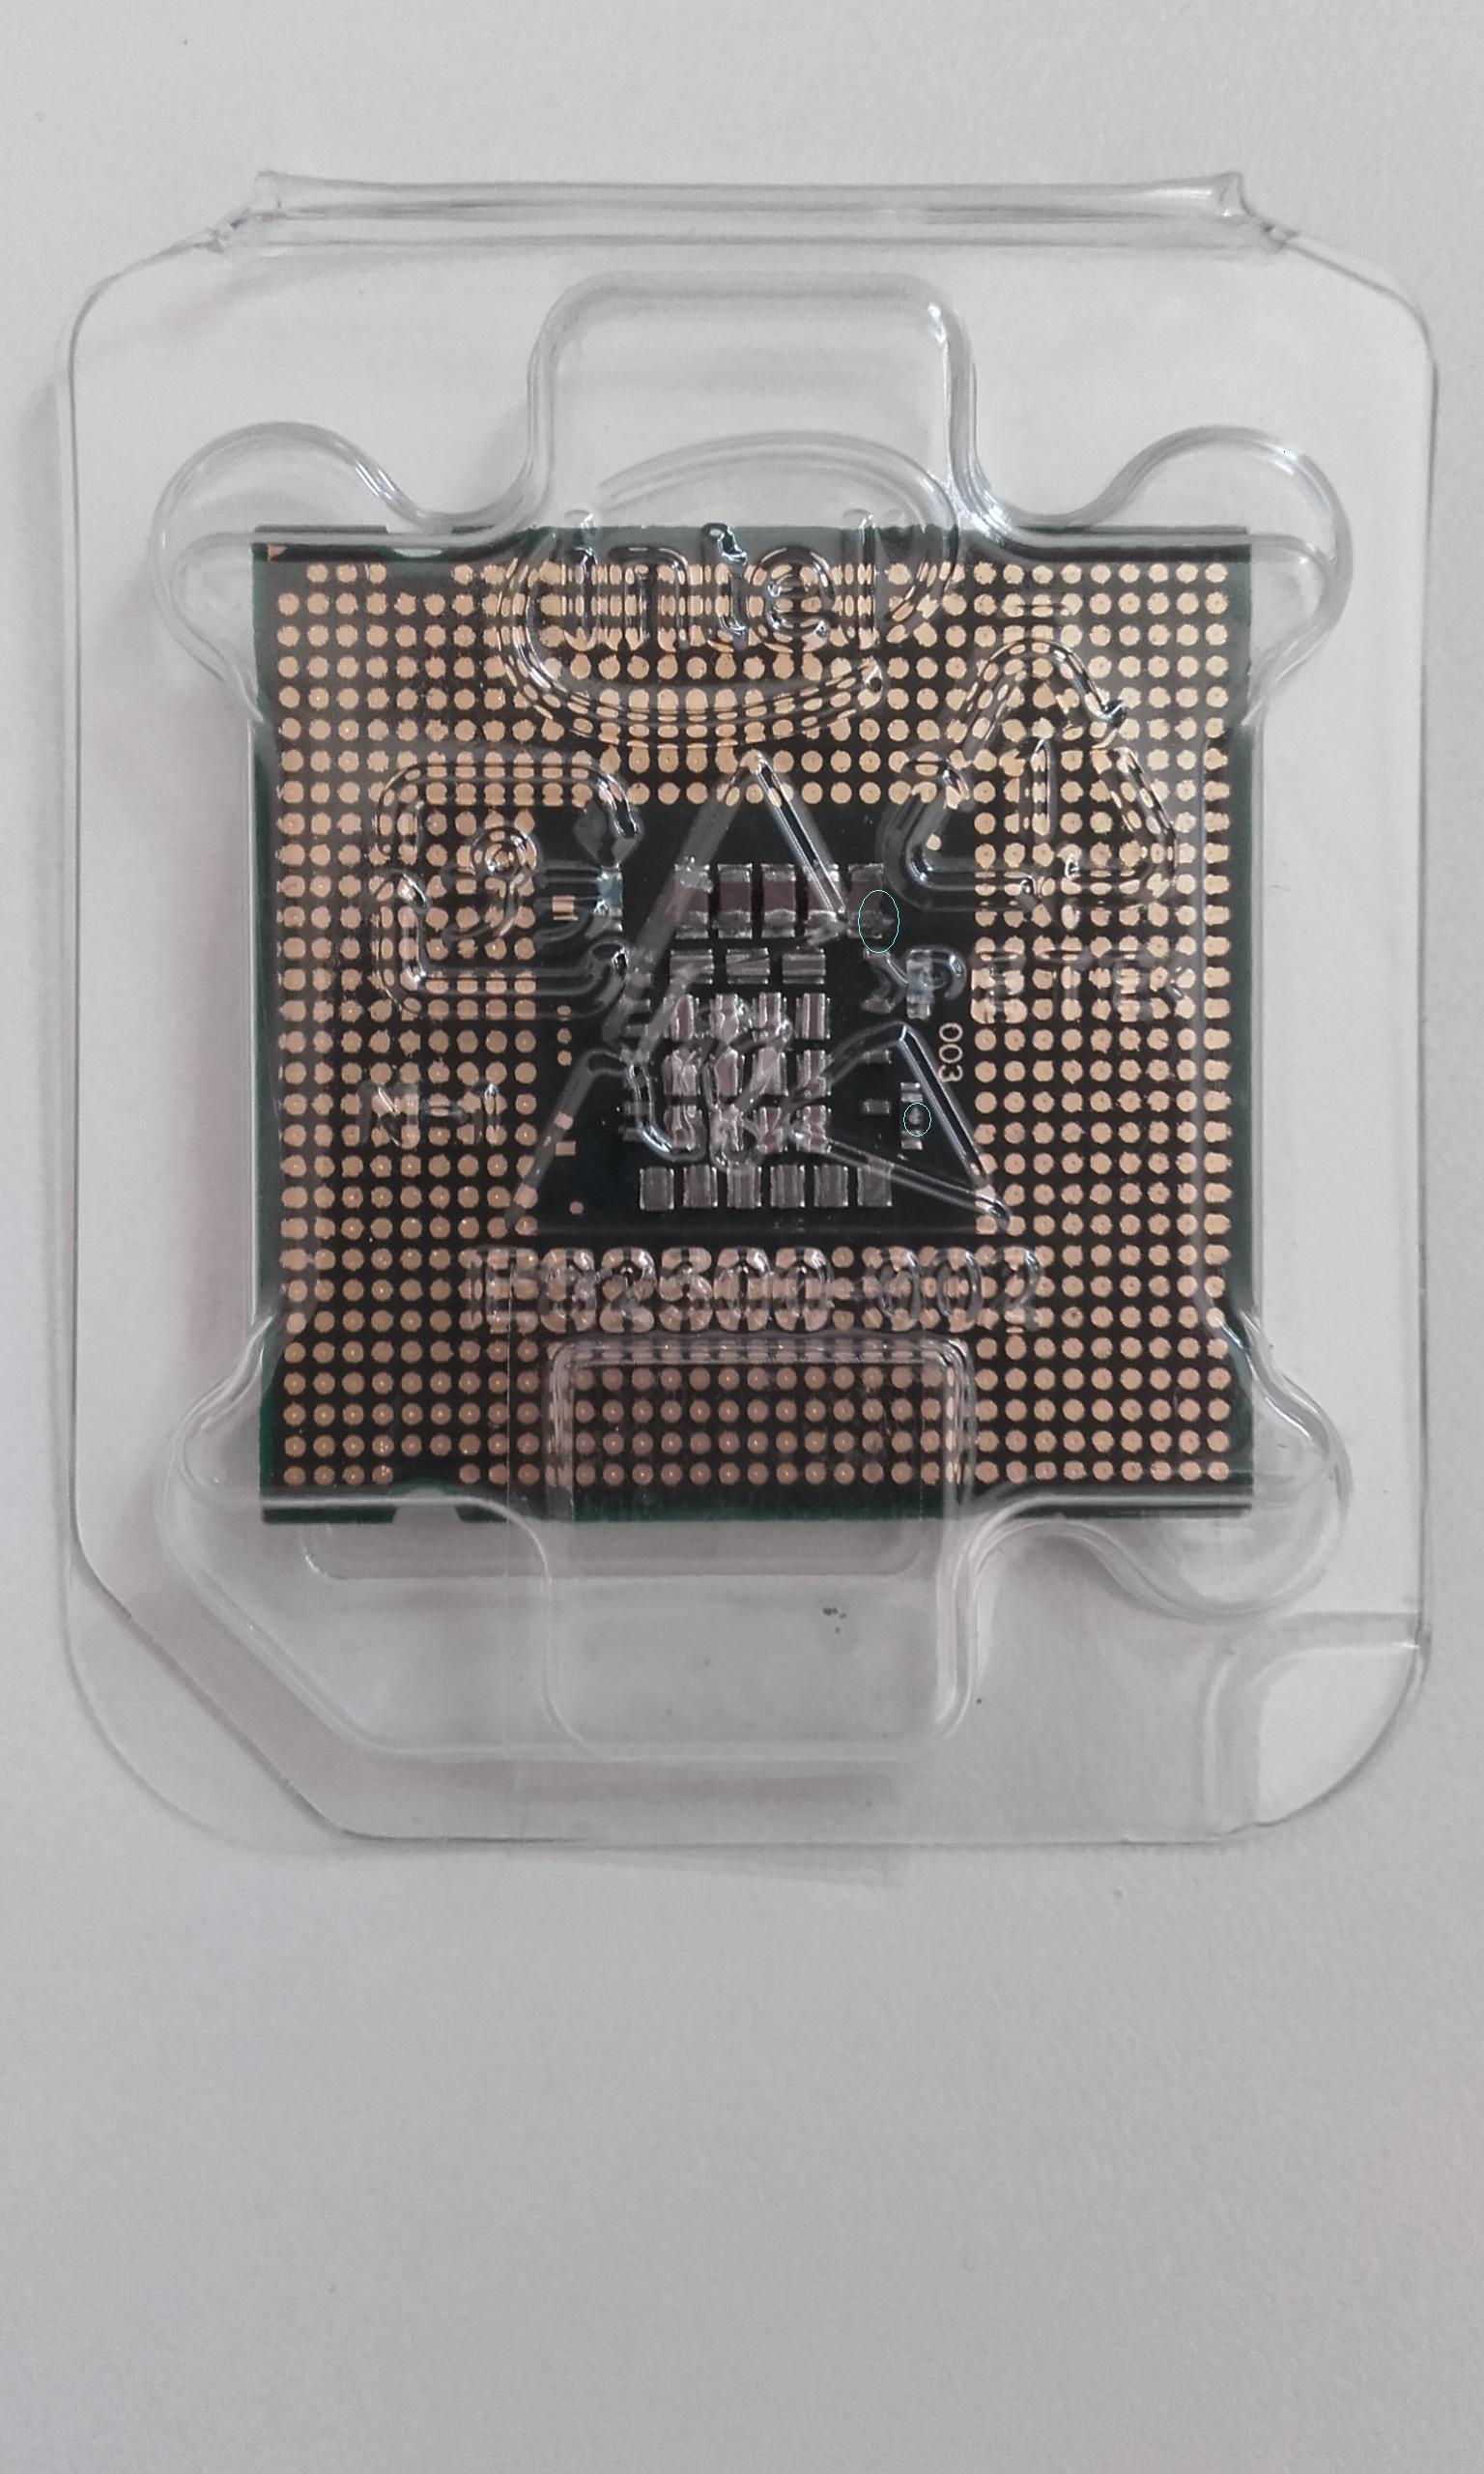 598586f2b7595-CPU2.JPG